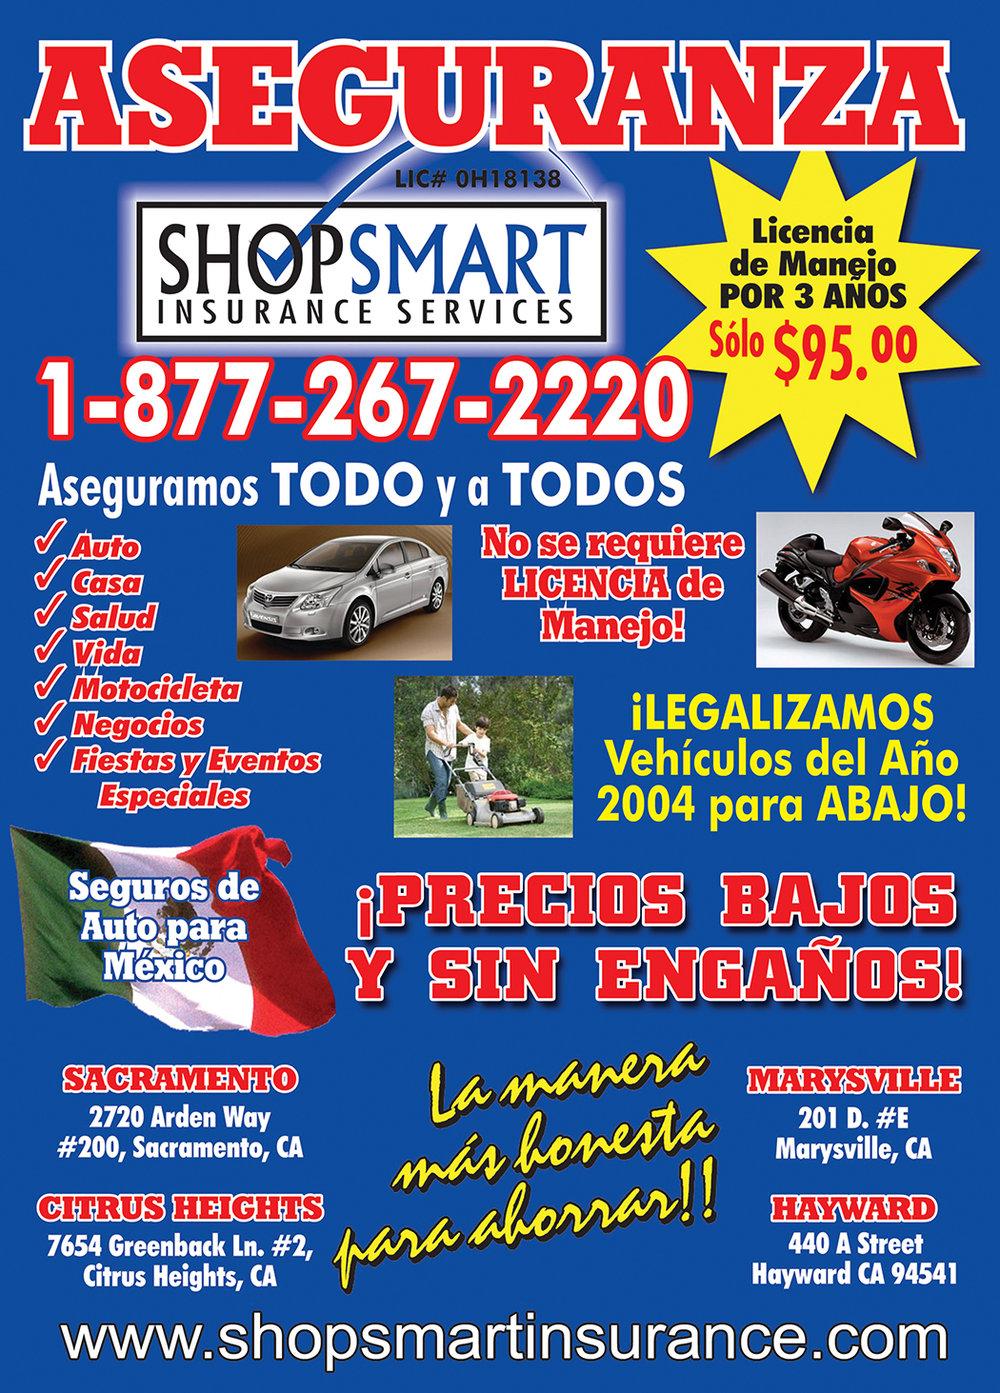 Shopsmart Insurance 1pag junio 2012 copy.jpg